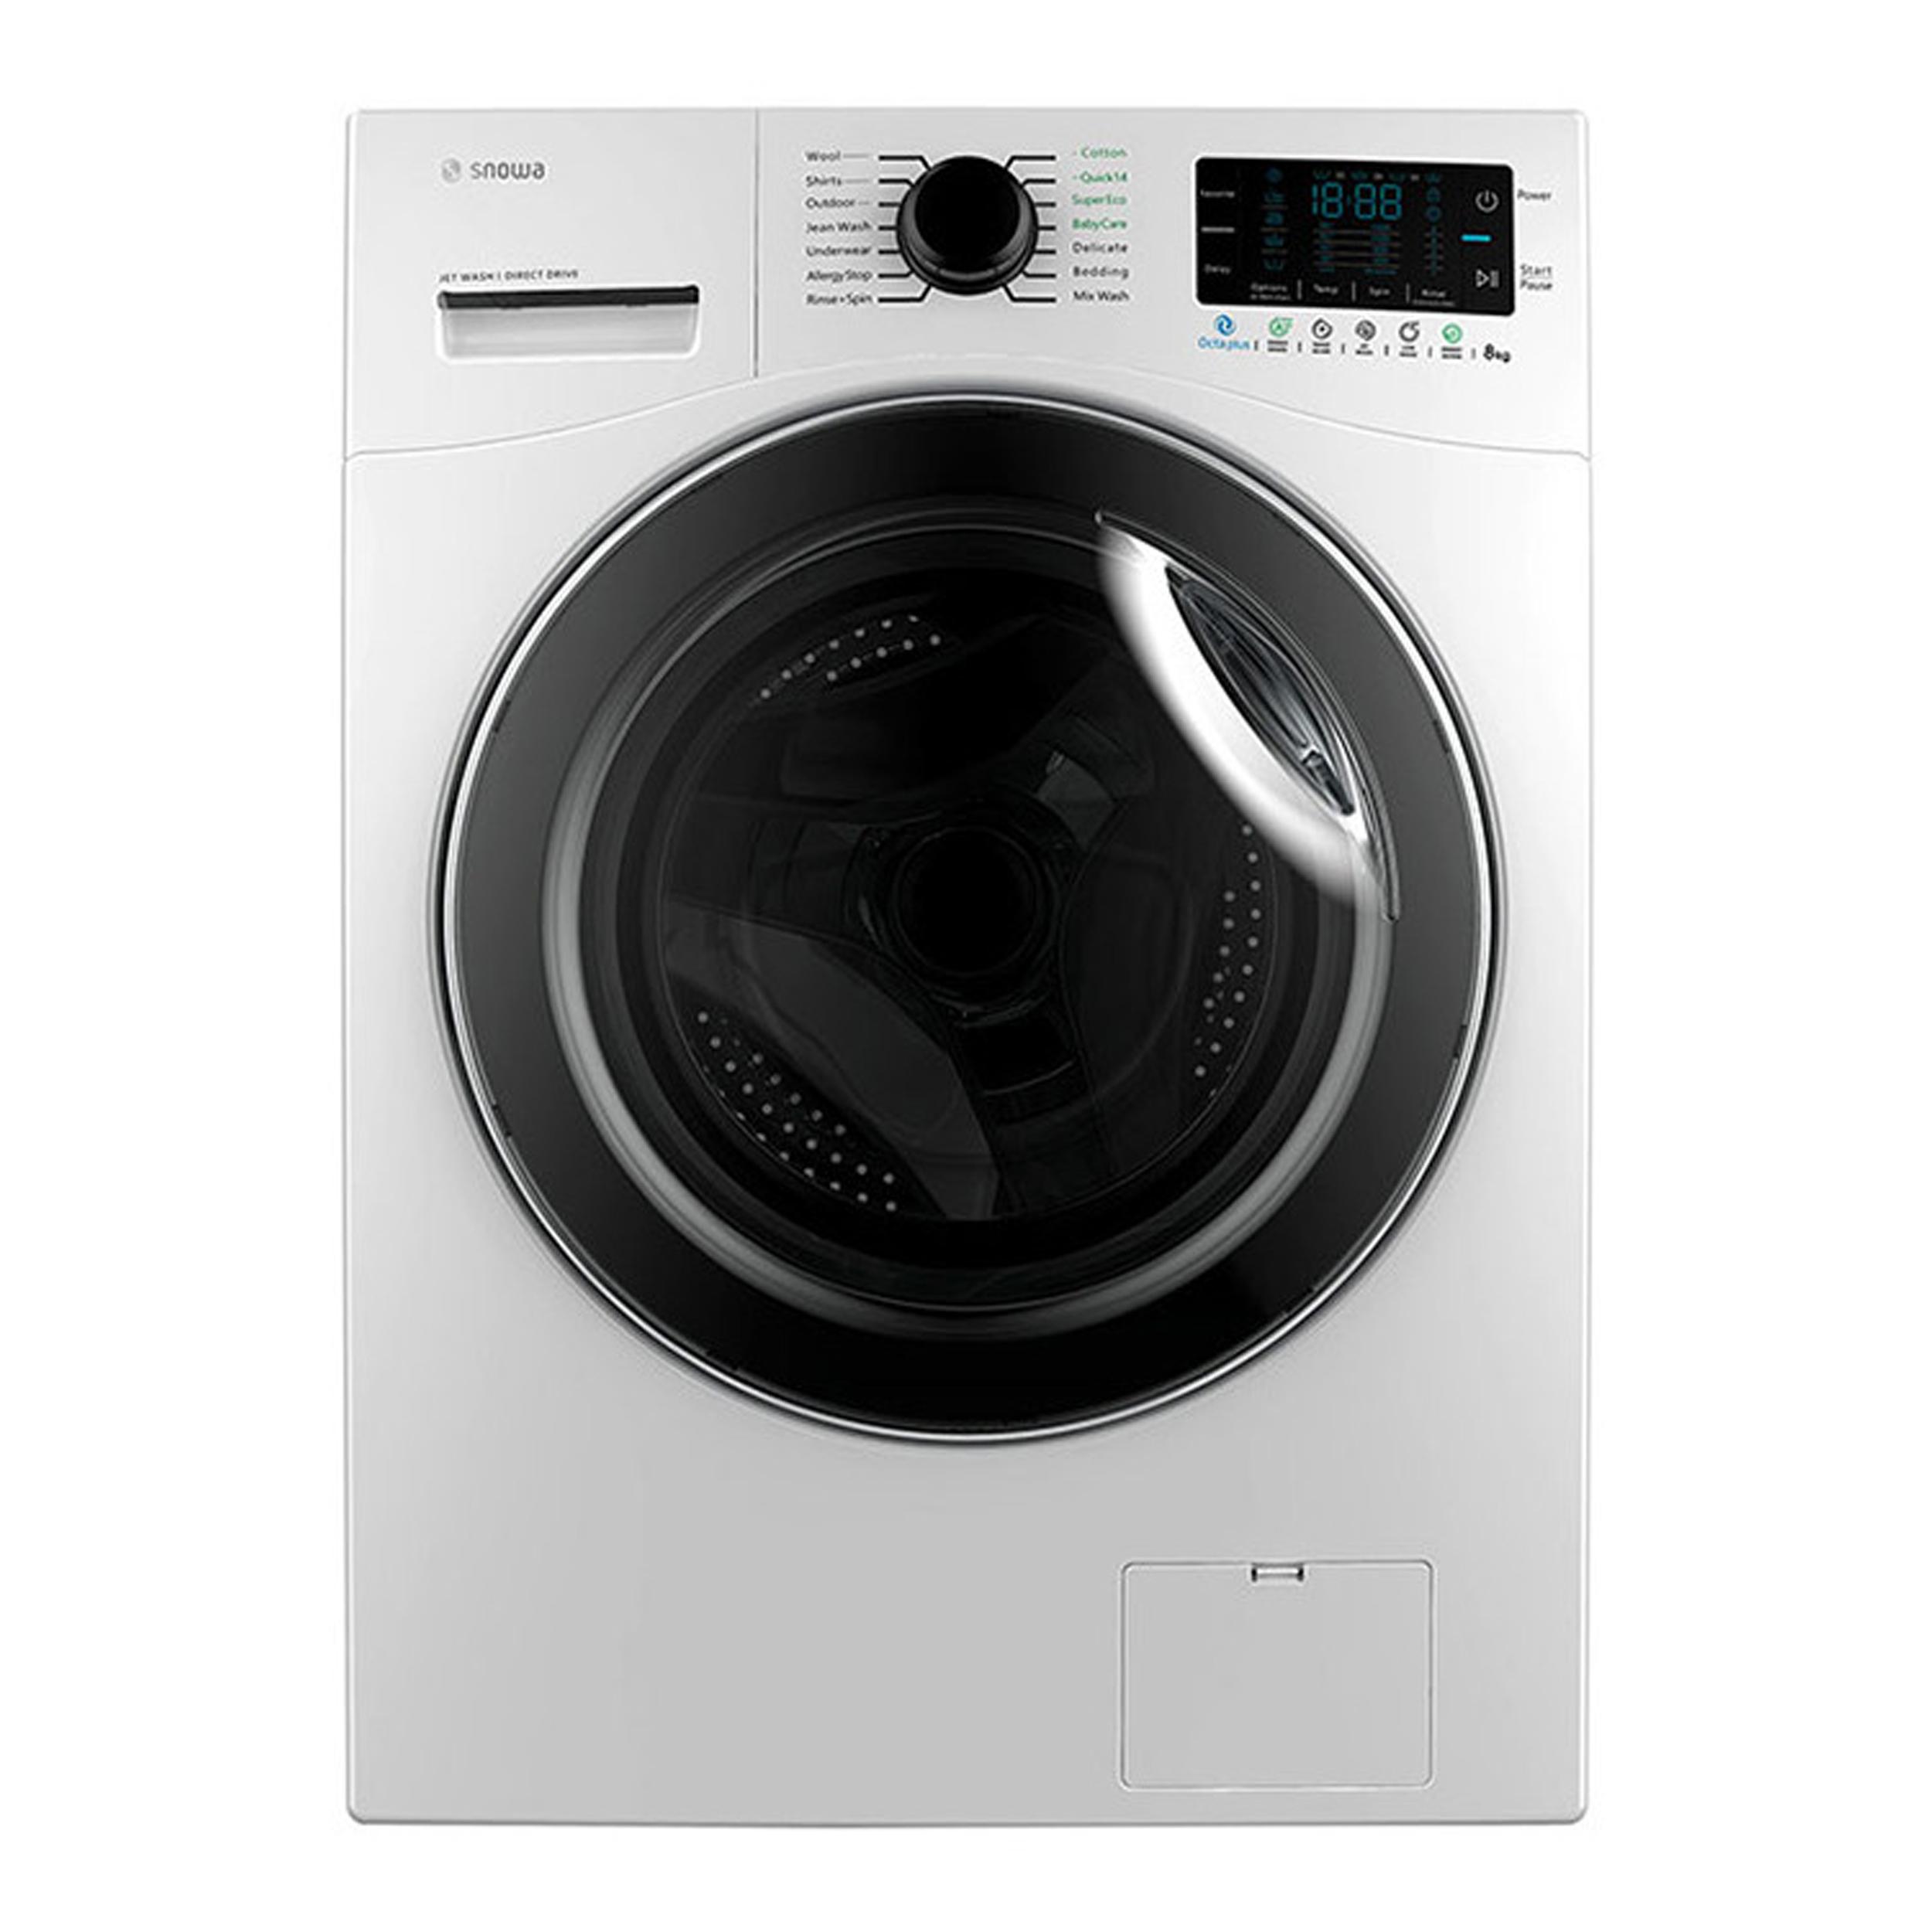 ماشین لباسشویی اسنوا مدل SWM-84516 ظرفیت 8 کیلوگرم main 1 1